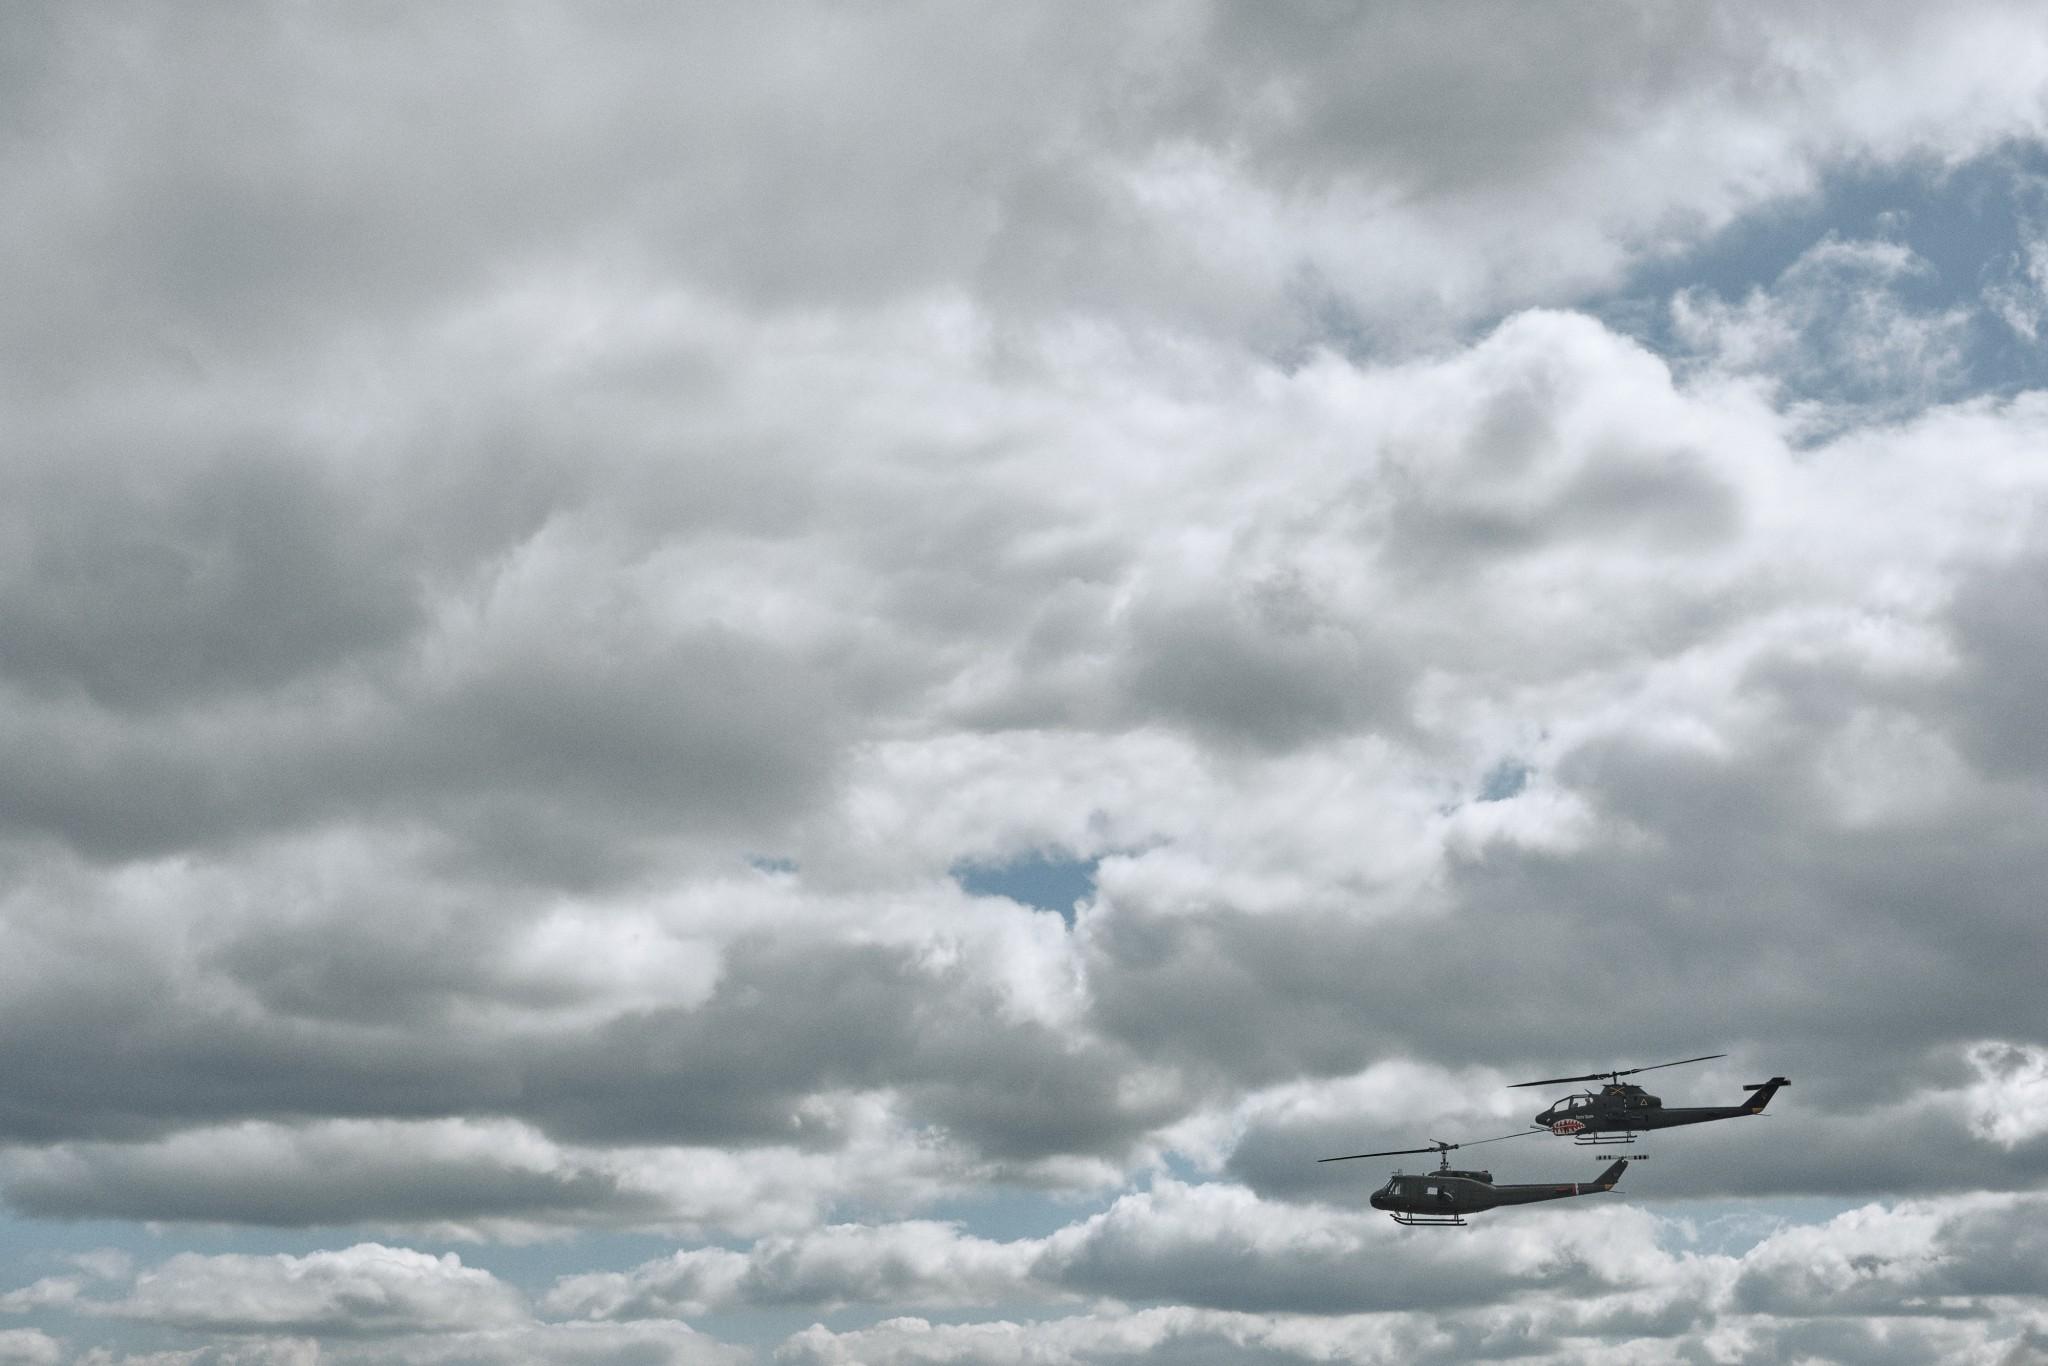 09---AH-1-Cobra---UH-H1-Huey---Brian-Reynolds---Ken-Collins.jpg